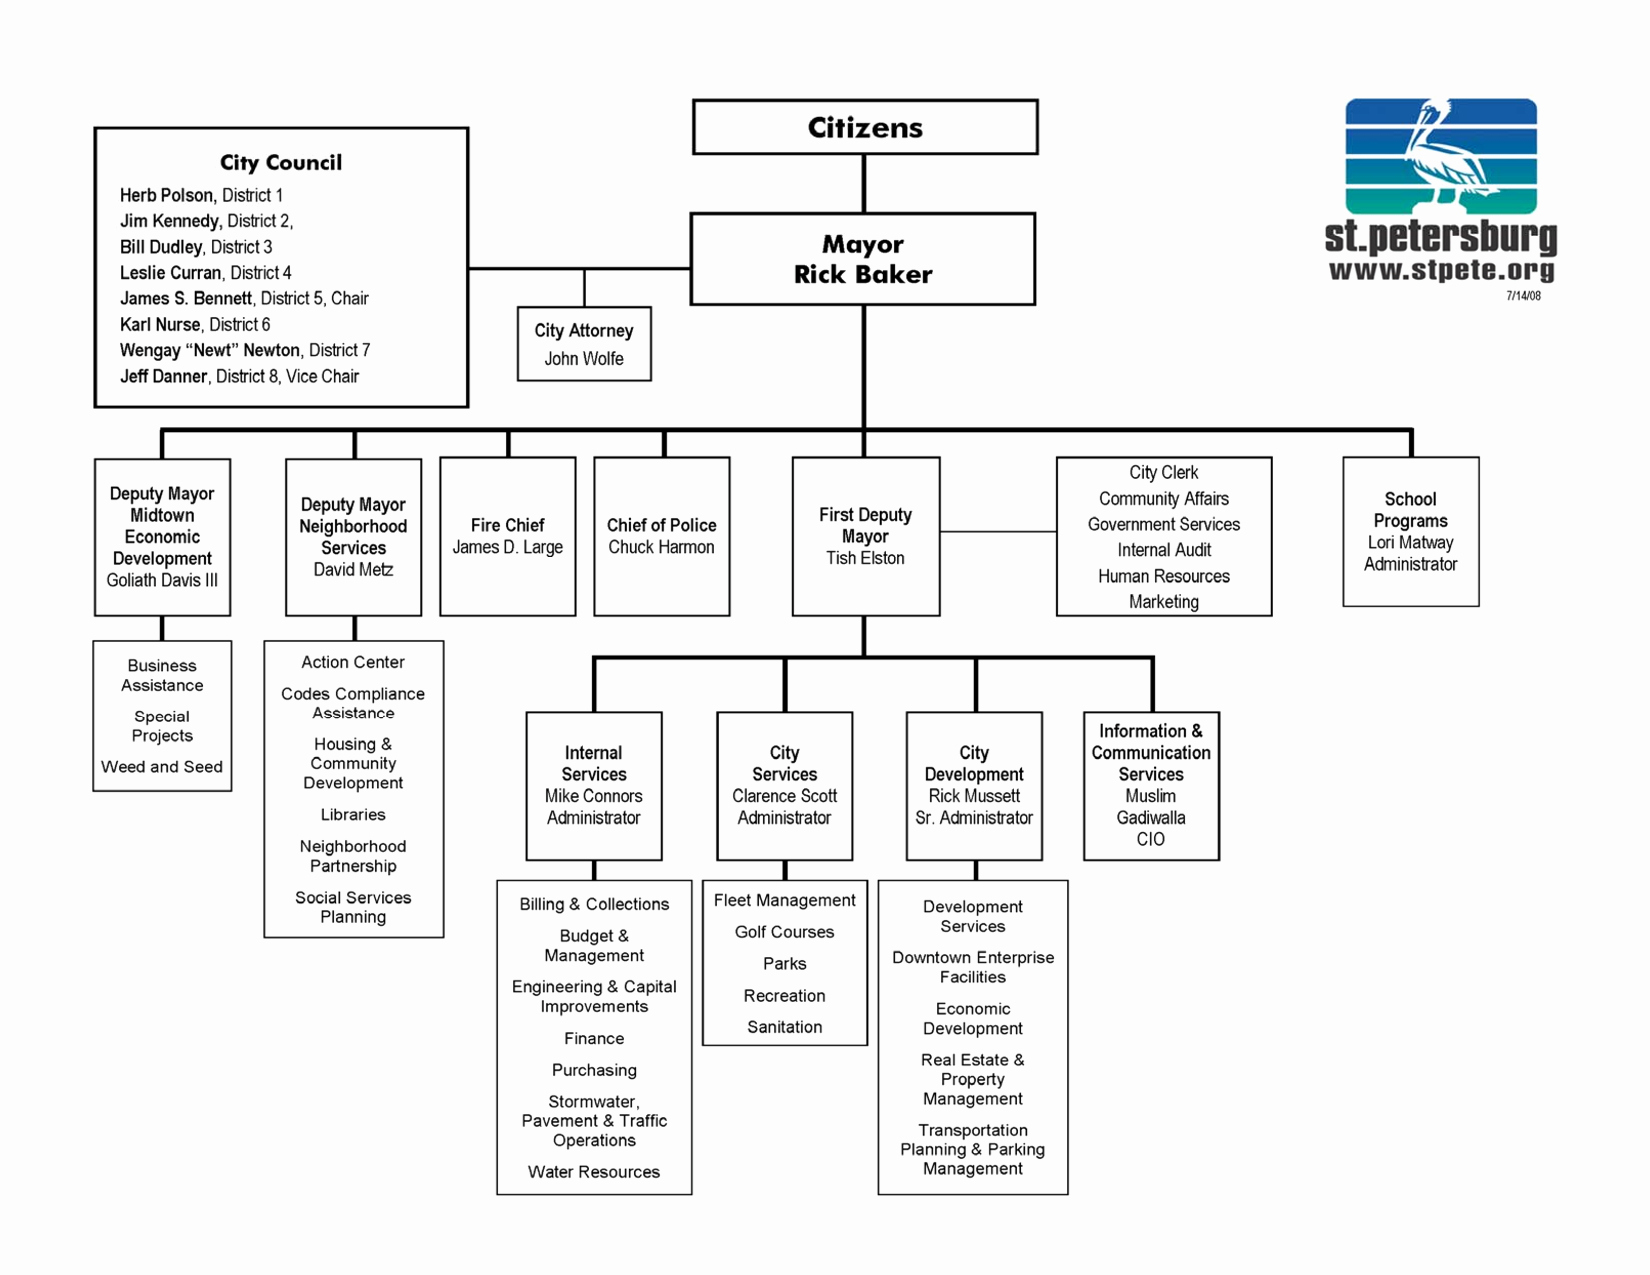 Word organizational Chart Template Inspirational organizational Chart Template Word